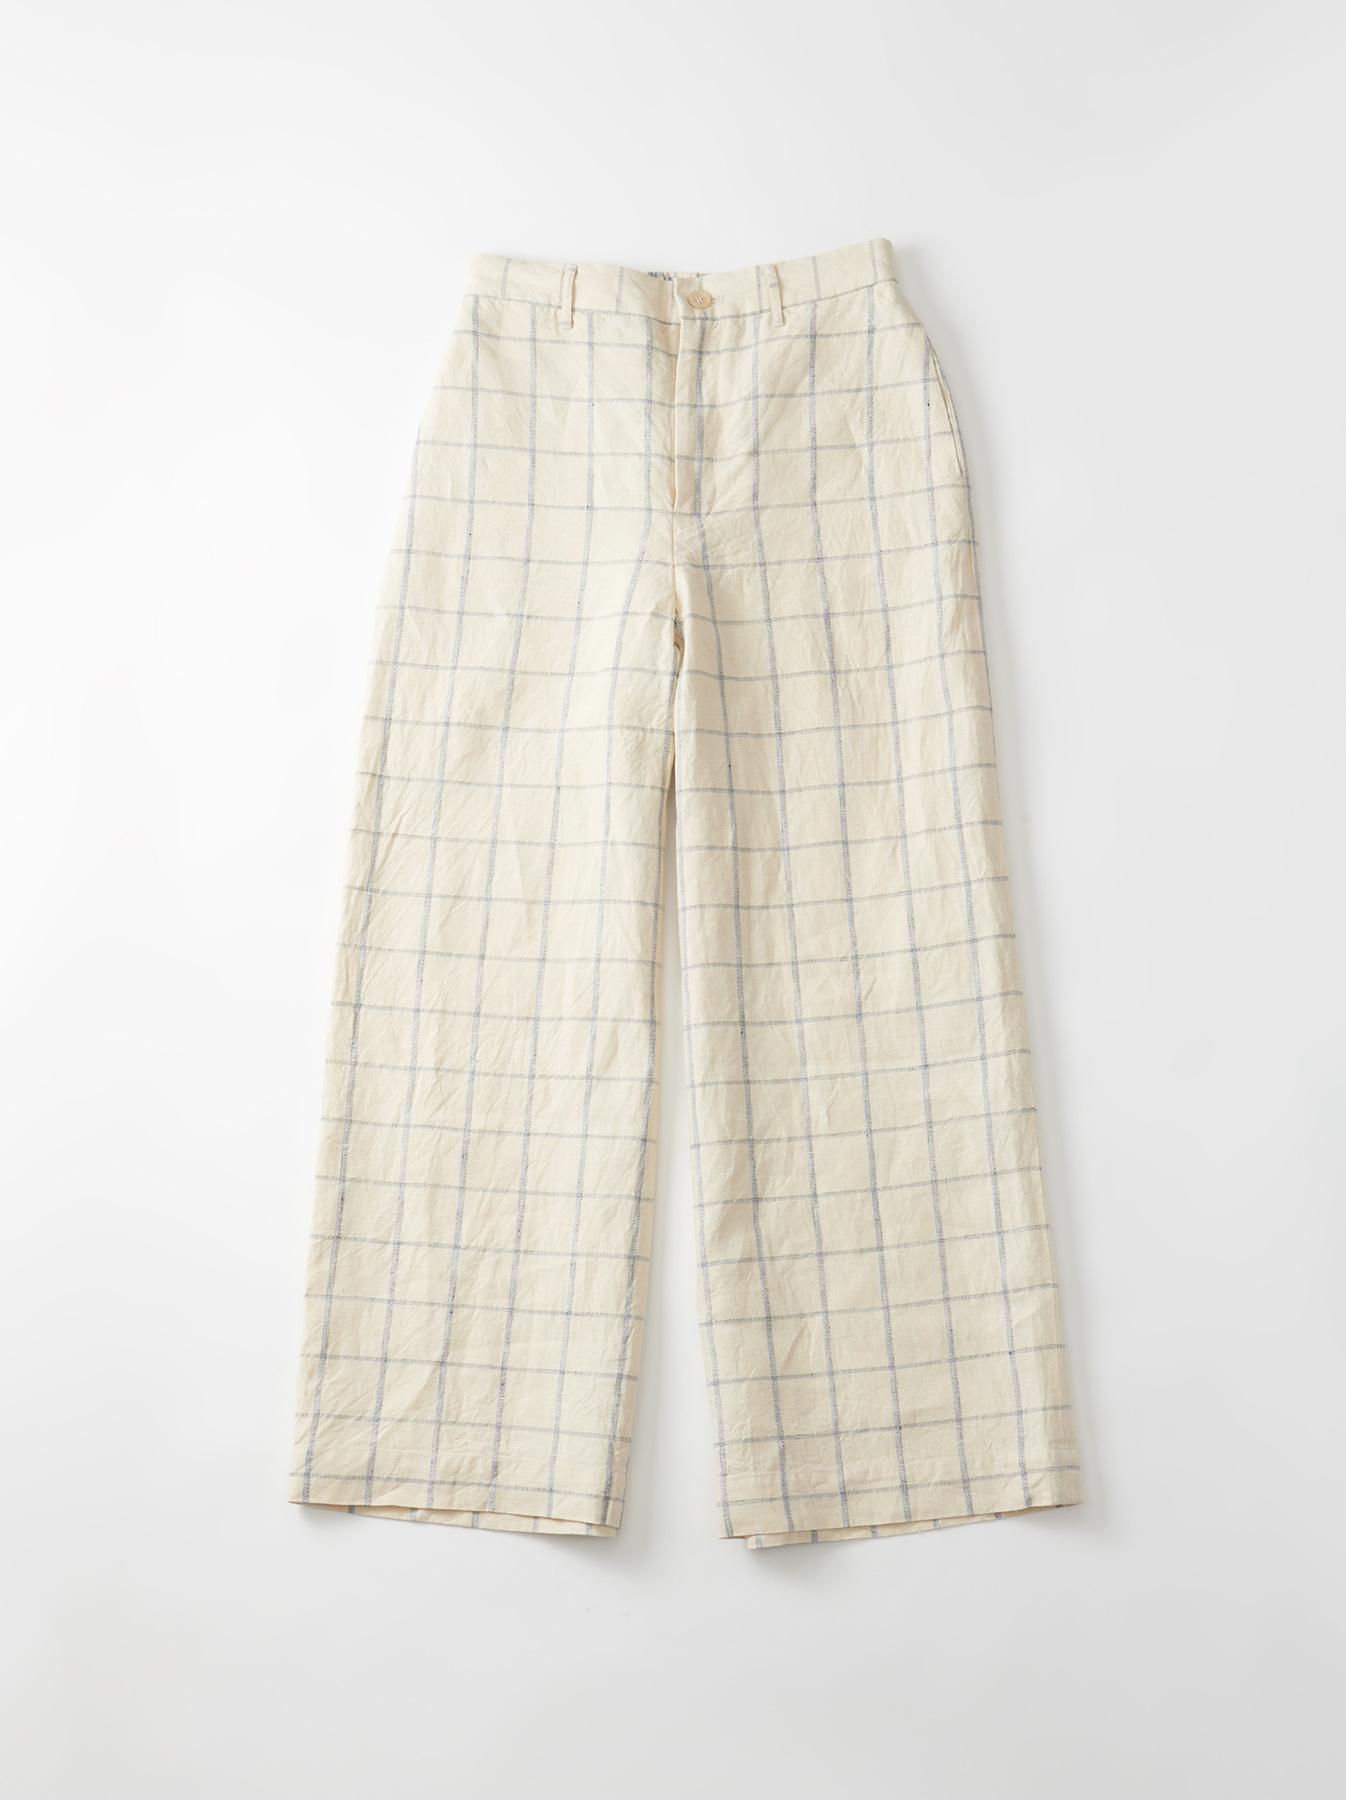 WH Linen 4545 Check Pants-1